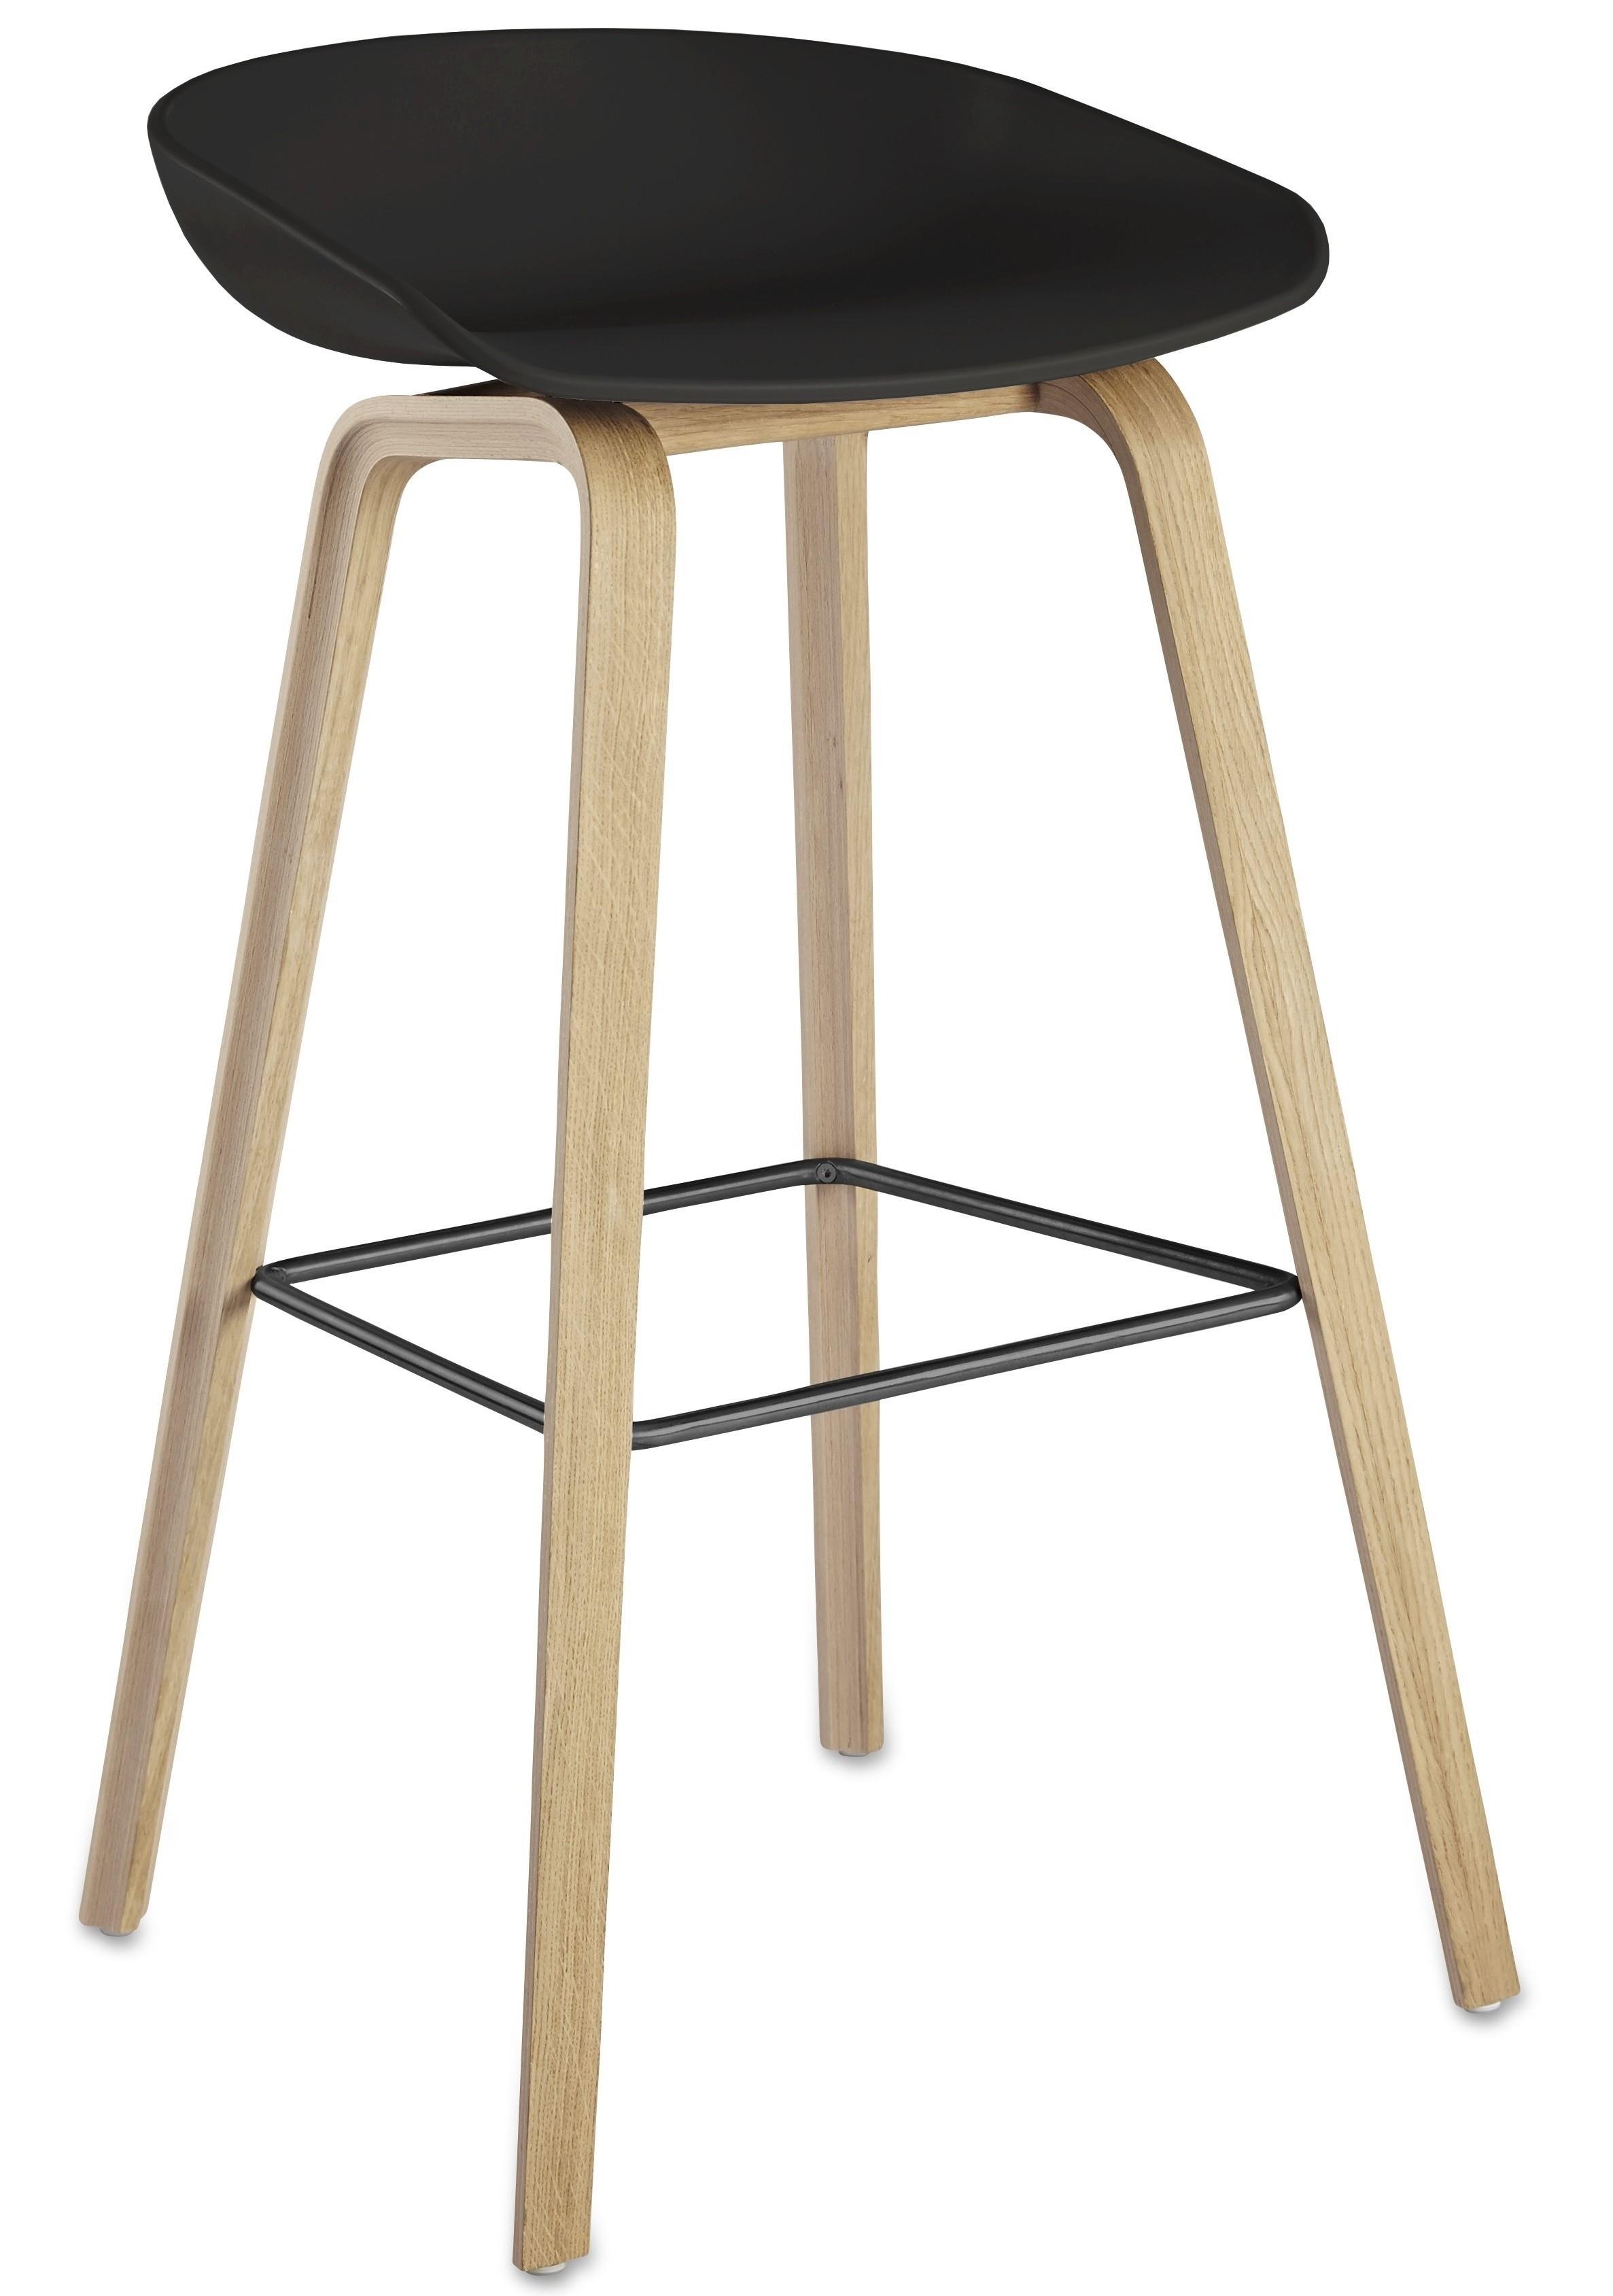 Stool AWAK, Wood, Black Seat